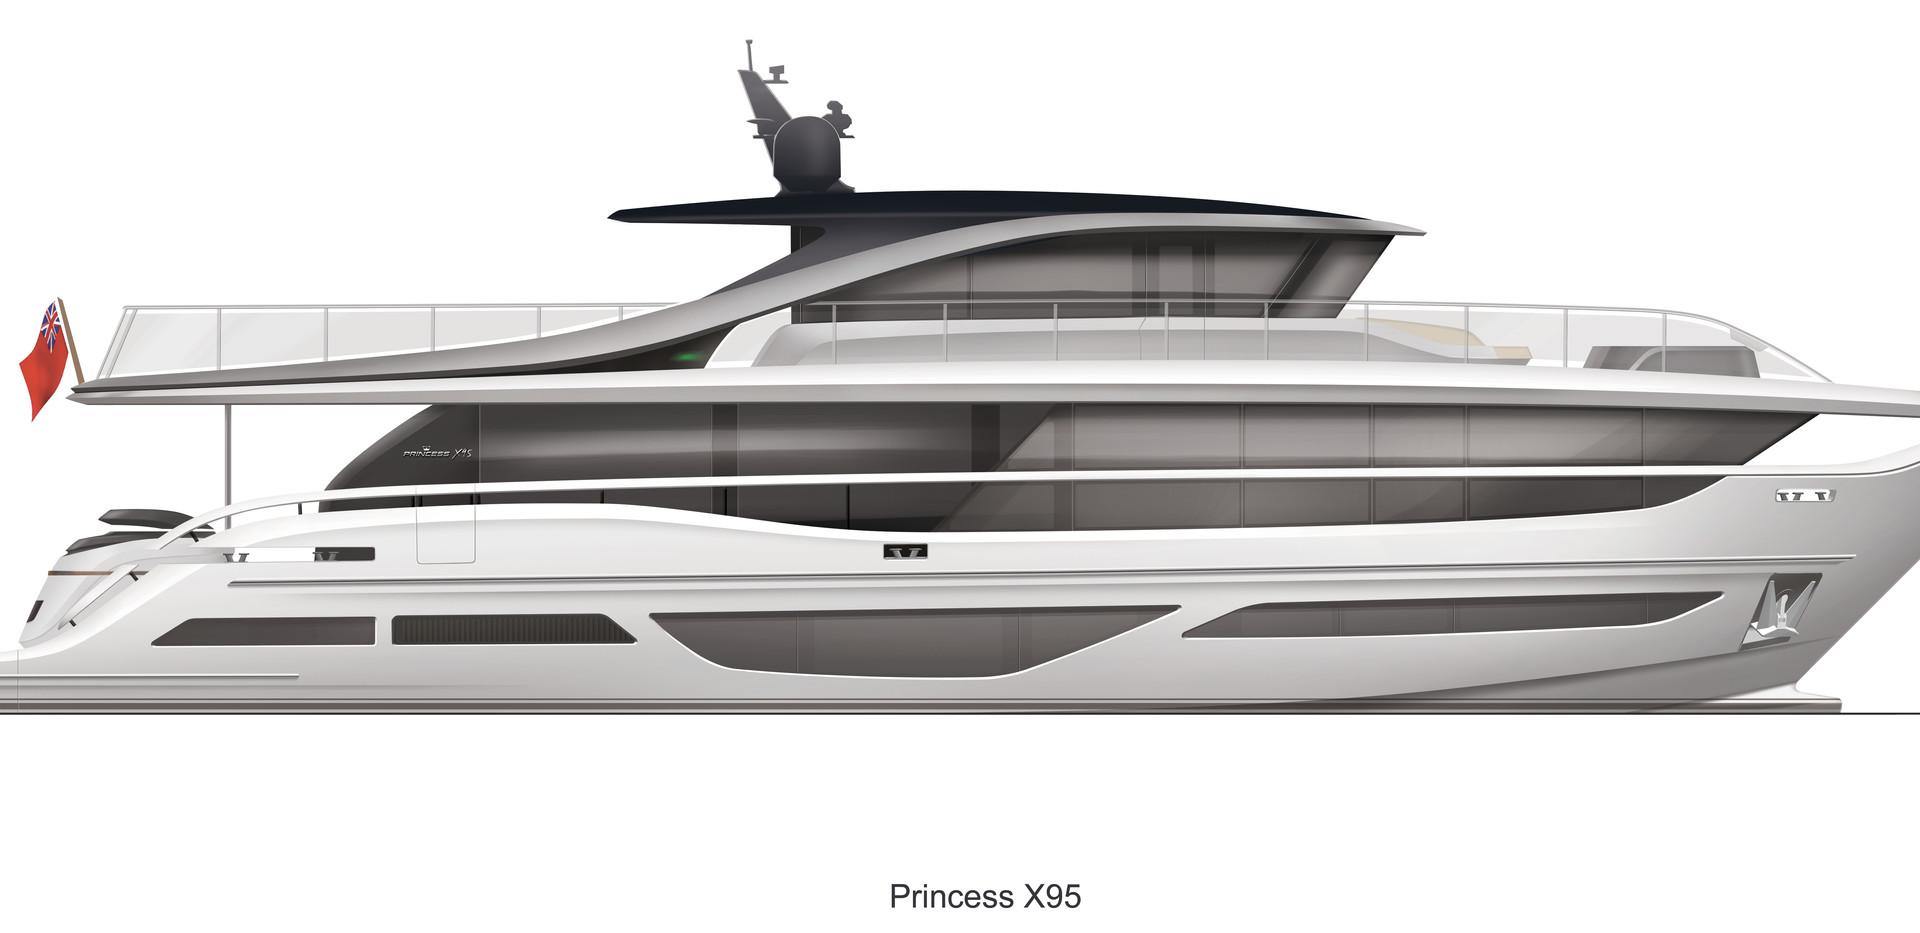 x95-profile-white-hull-and-transom-versi